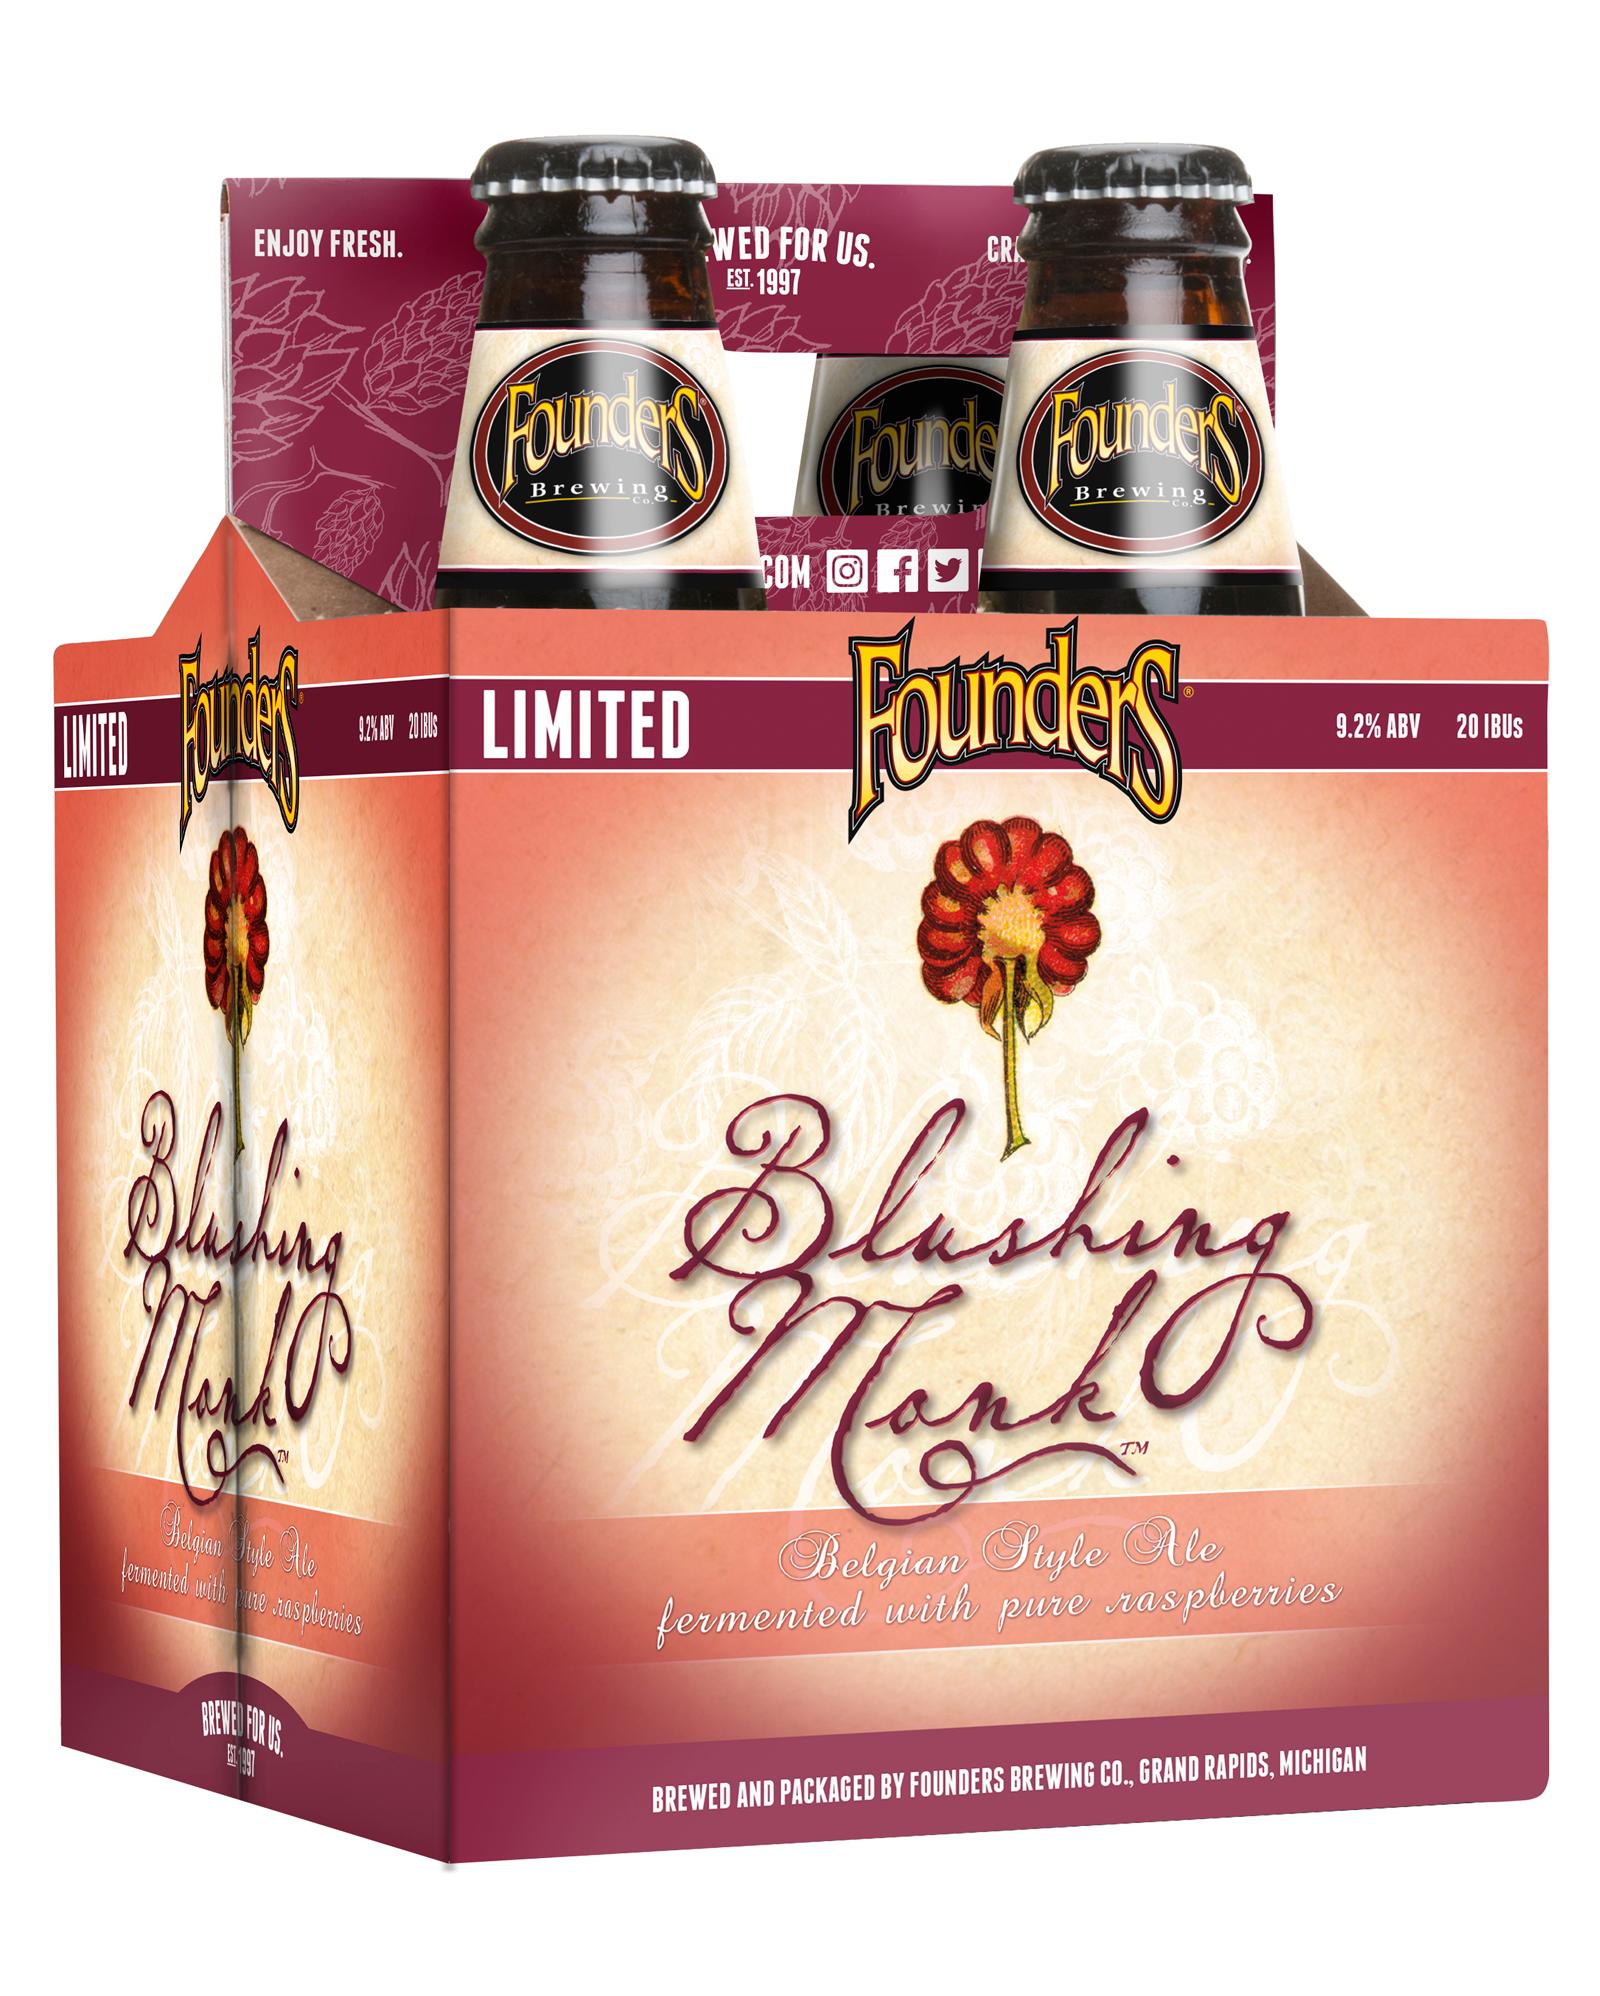 blushing_monk_bottle_carrier_3-4